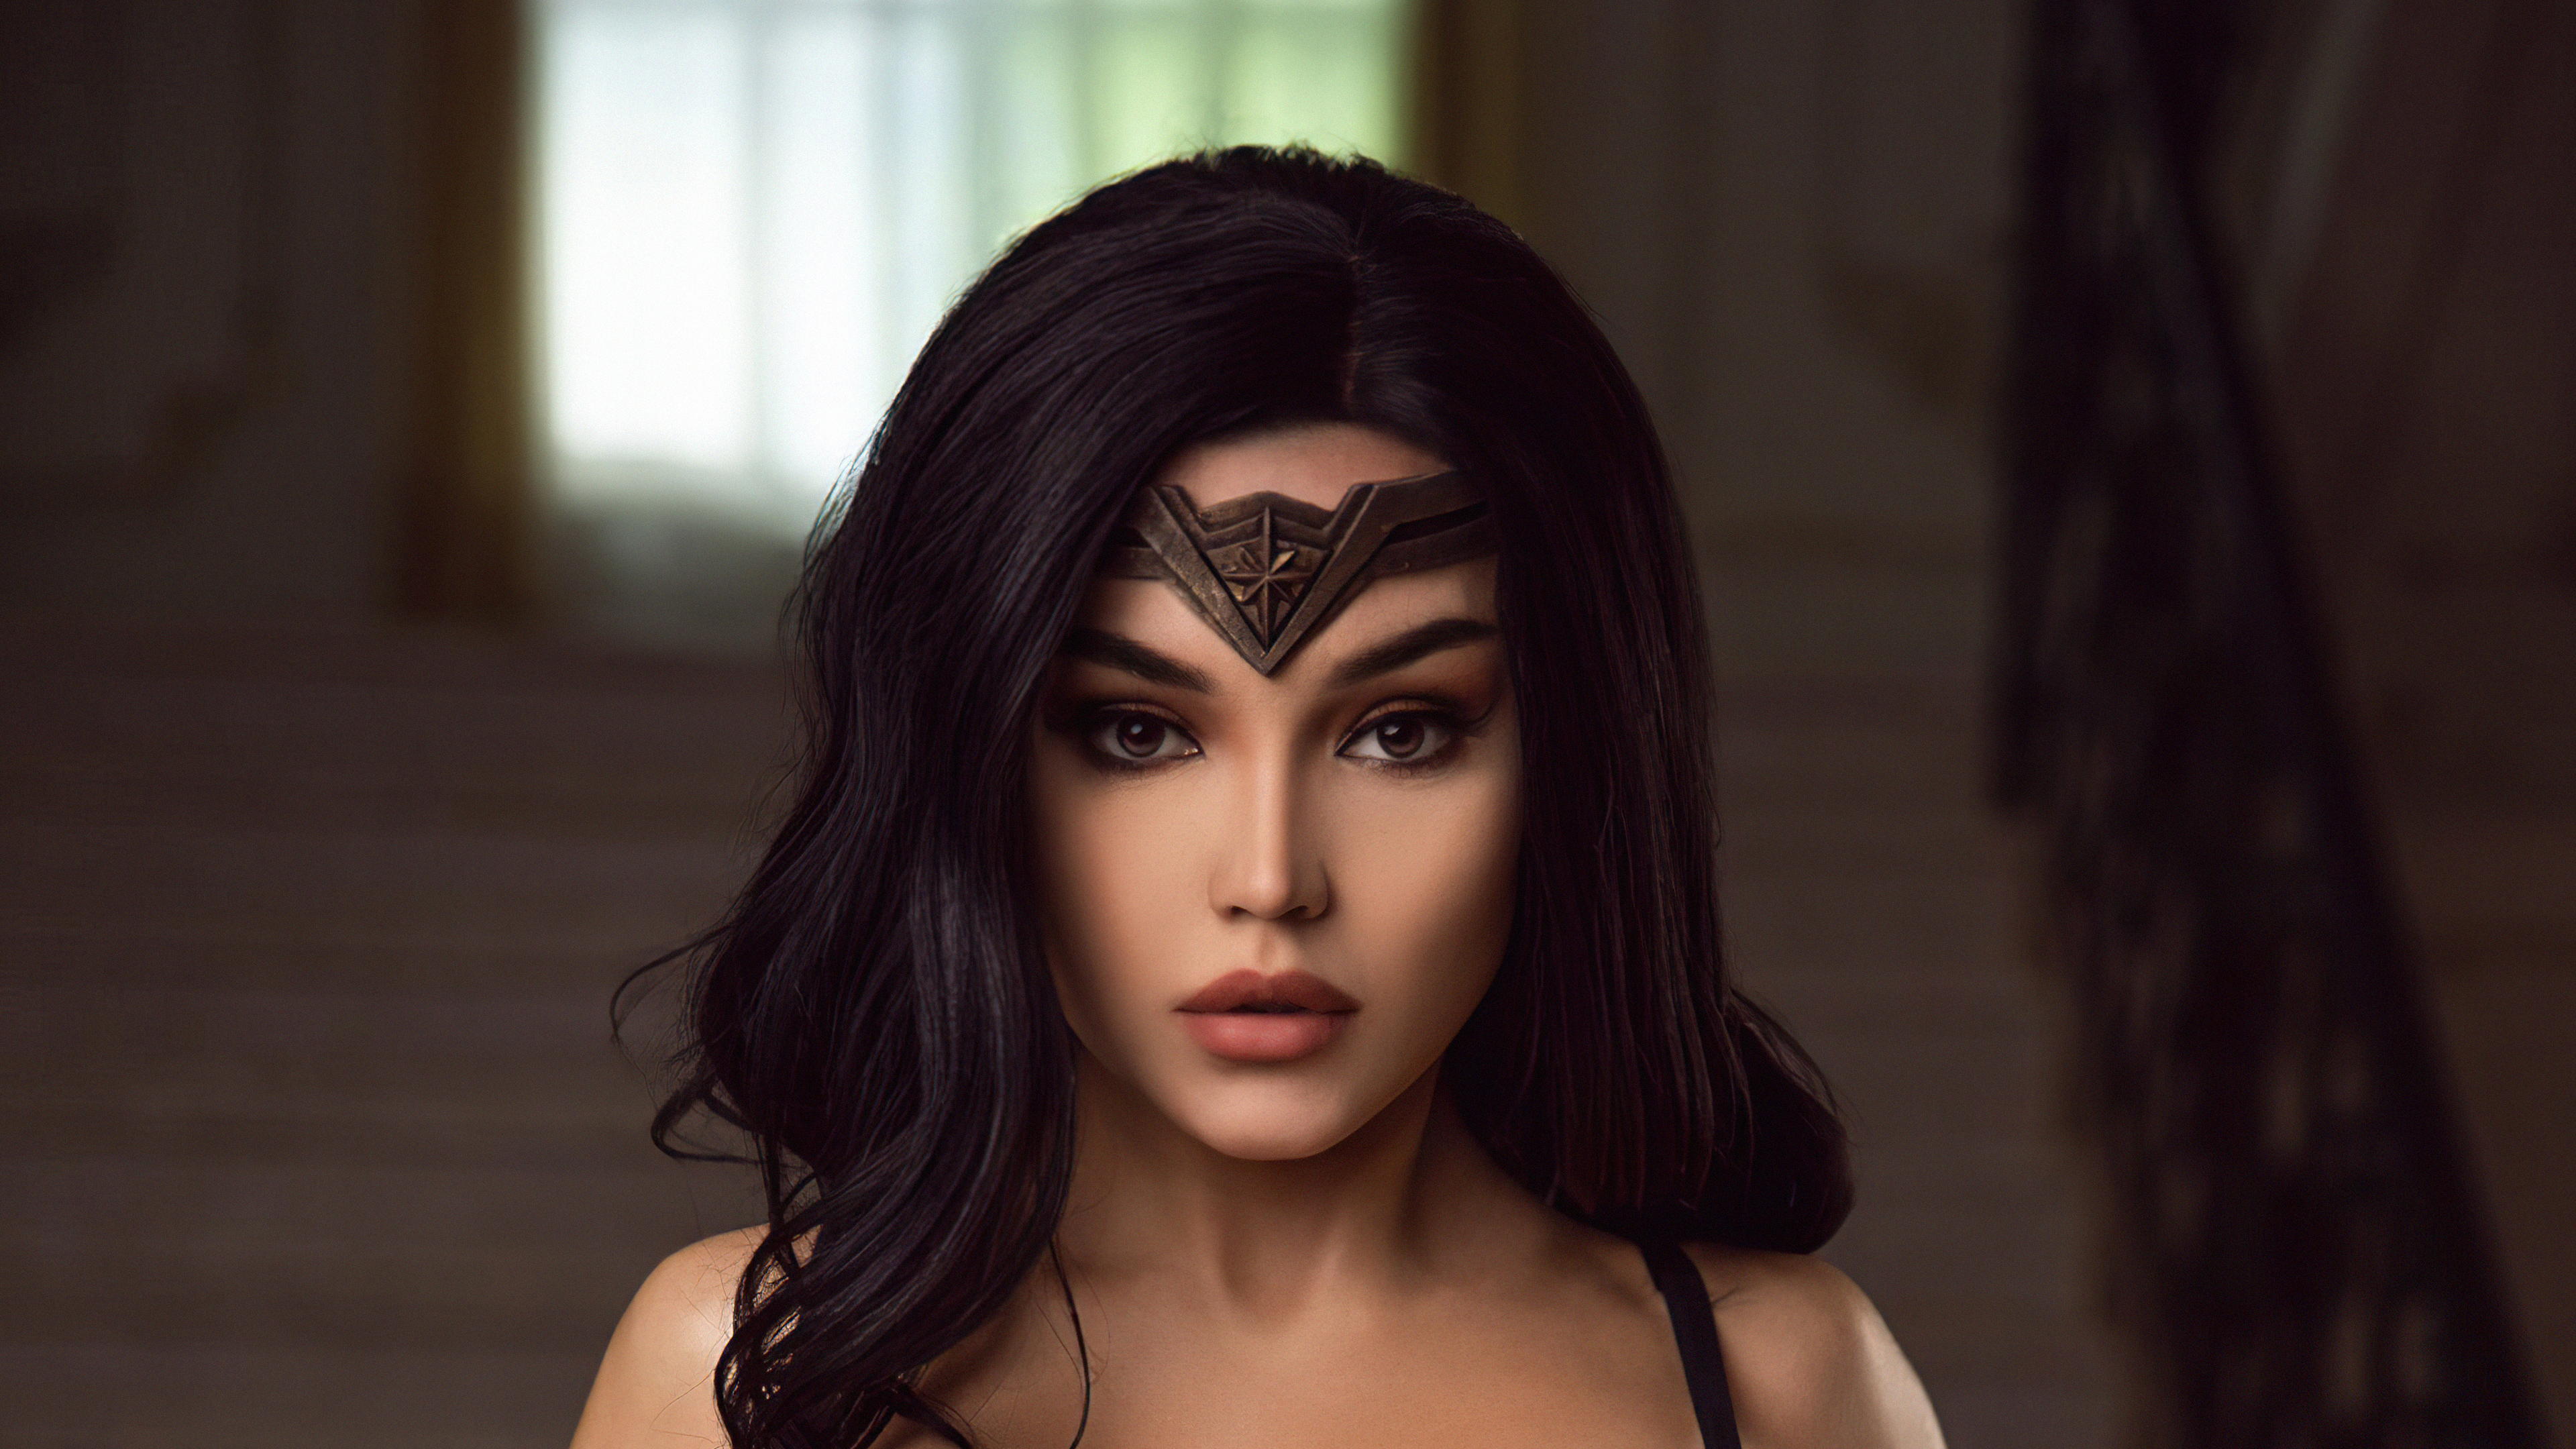 cosplay of wonder woman 1984 portrait 4k 1618165518 - Cosplay Of Wonder Woman 1984 Portrait 4k - Cosplay Of Wonder Woman 1984 Portrait 4k wallpapers